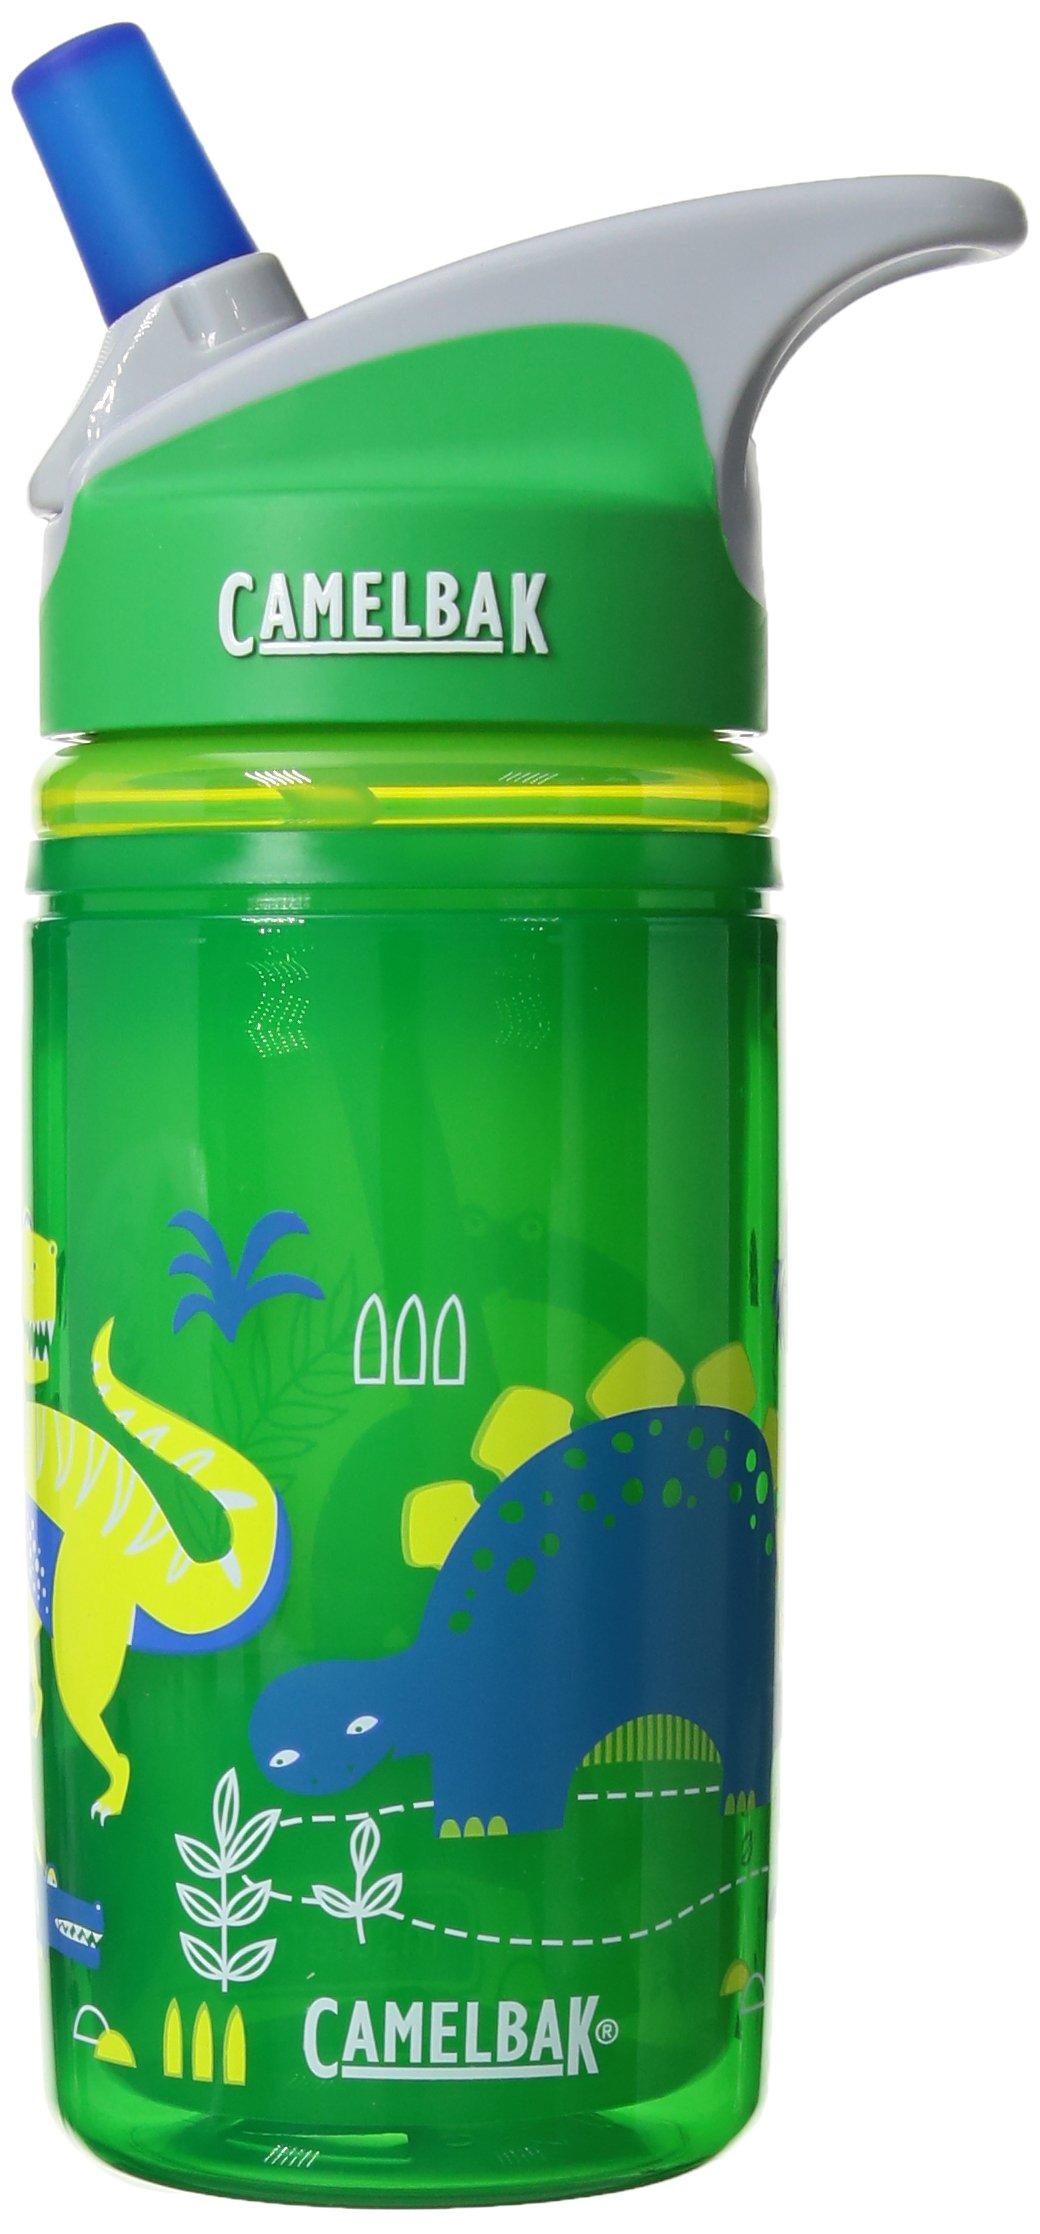 CamelBak Eddy Kids Insulated Water Bottle, Green Dino, 12oz by CamelBak (Image #1)